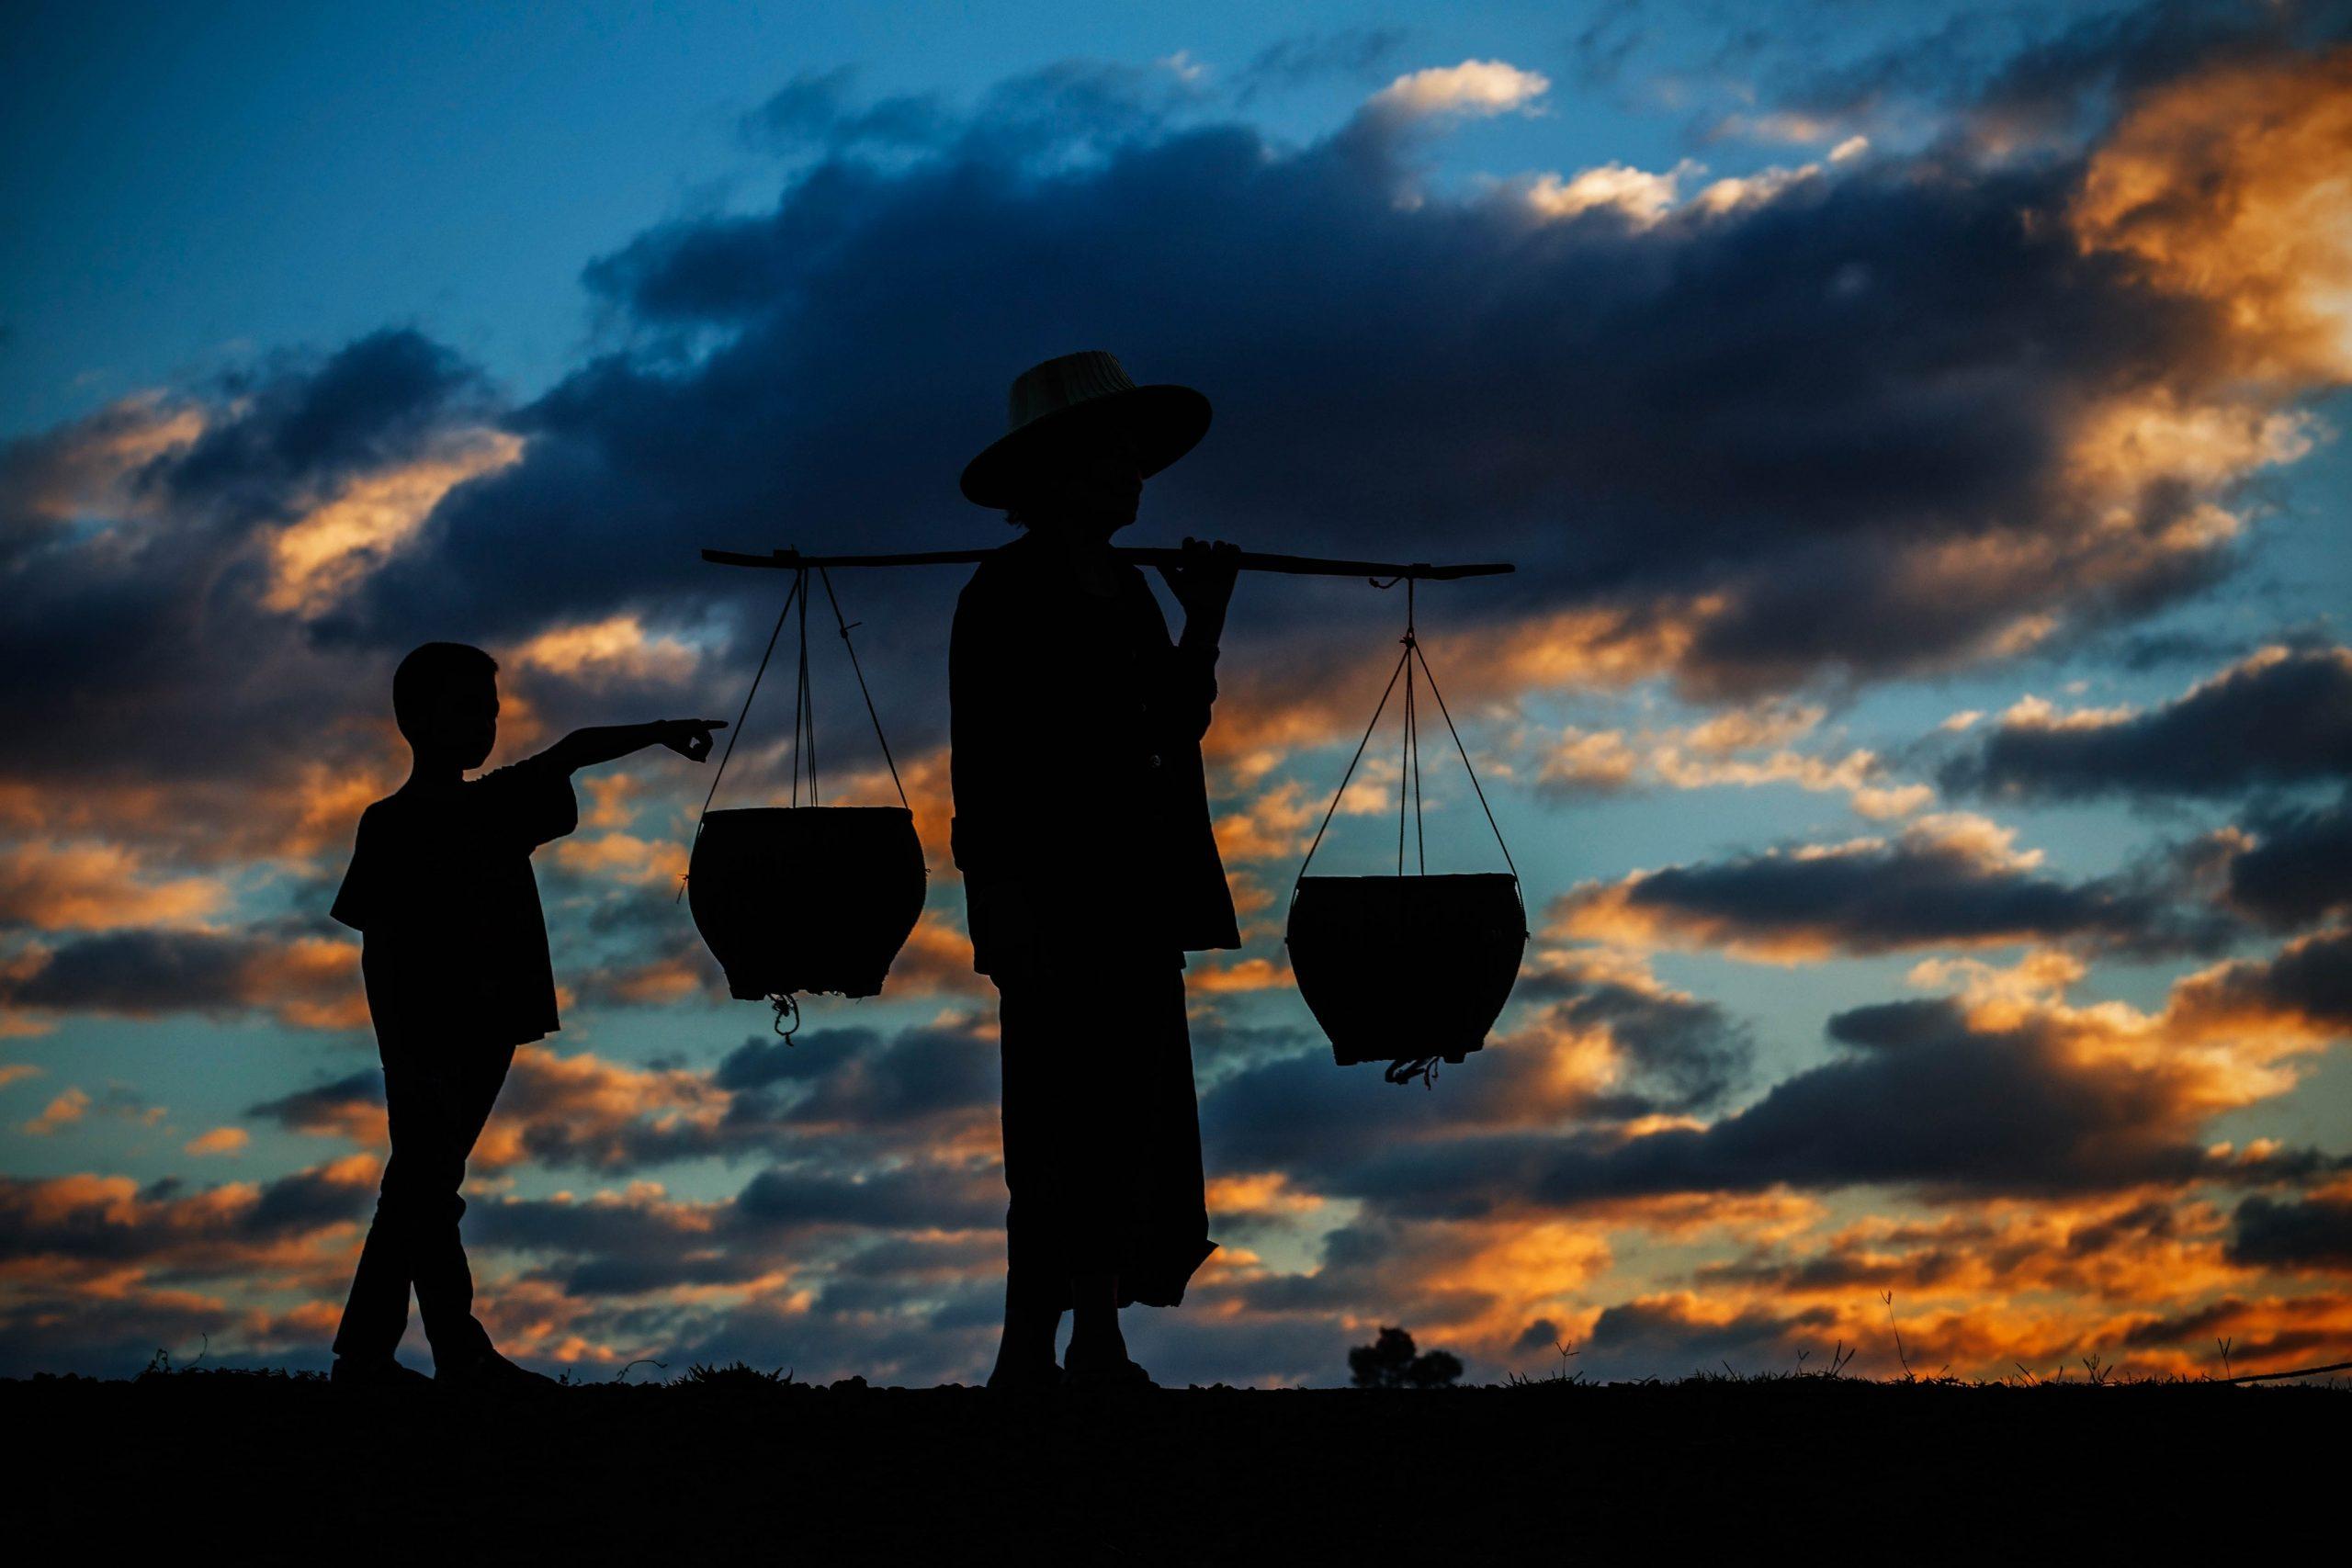 rural life at sunset.